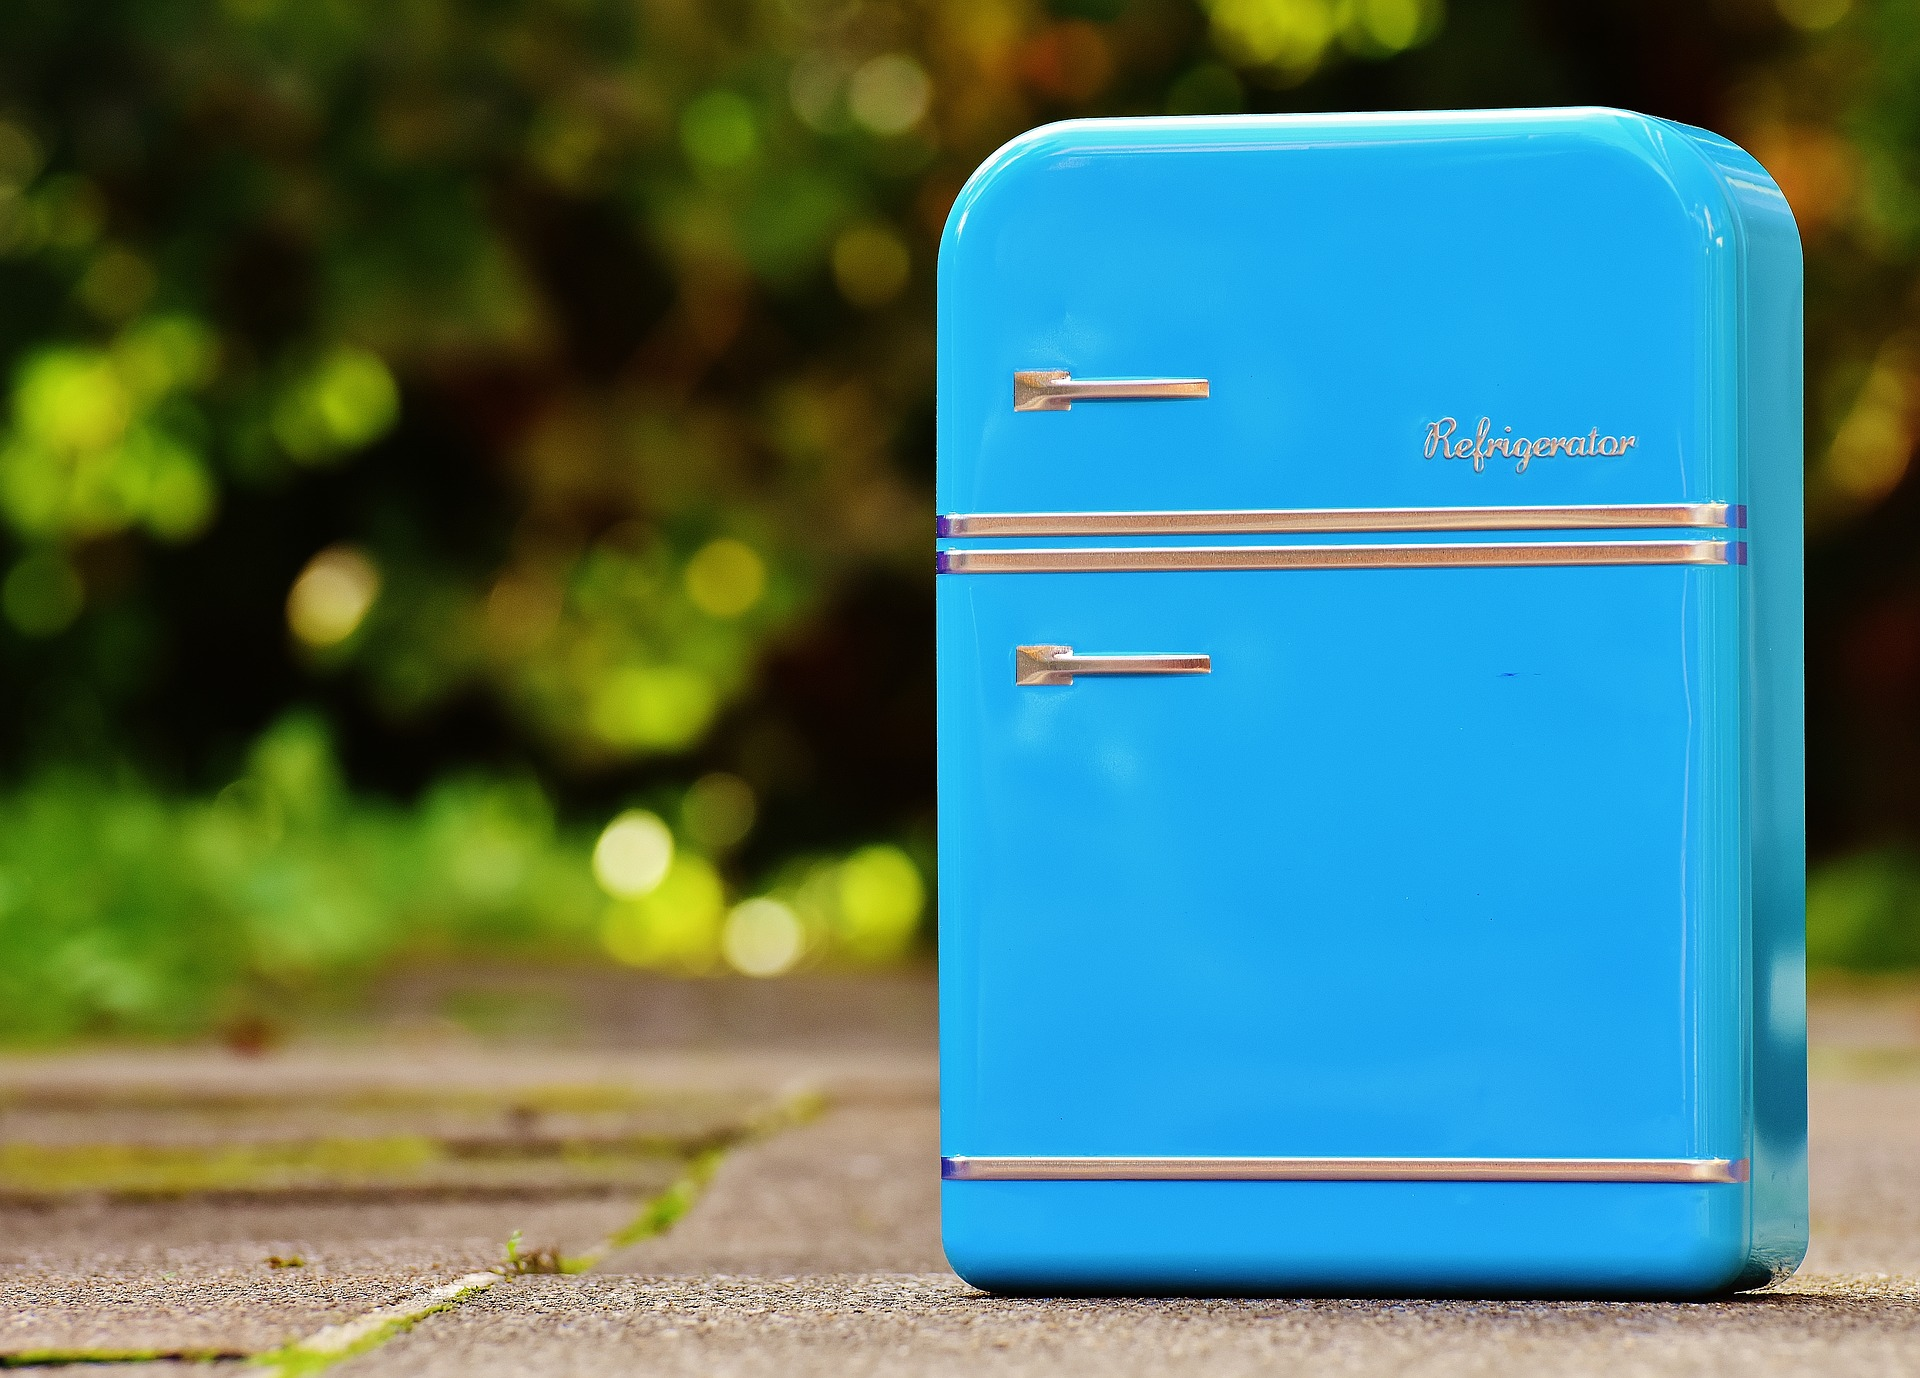 Mini blue refrigerator